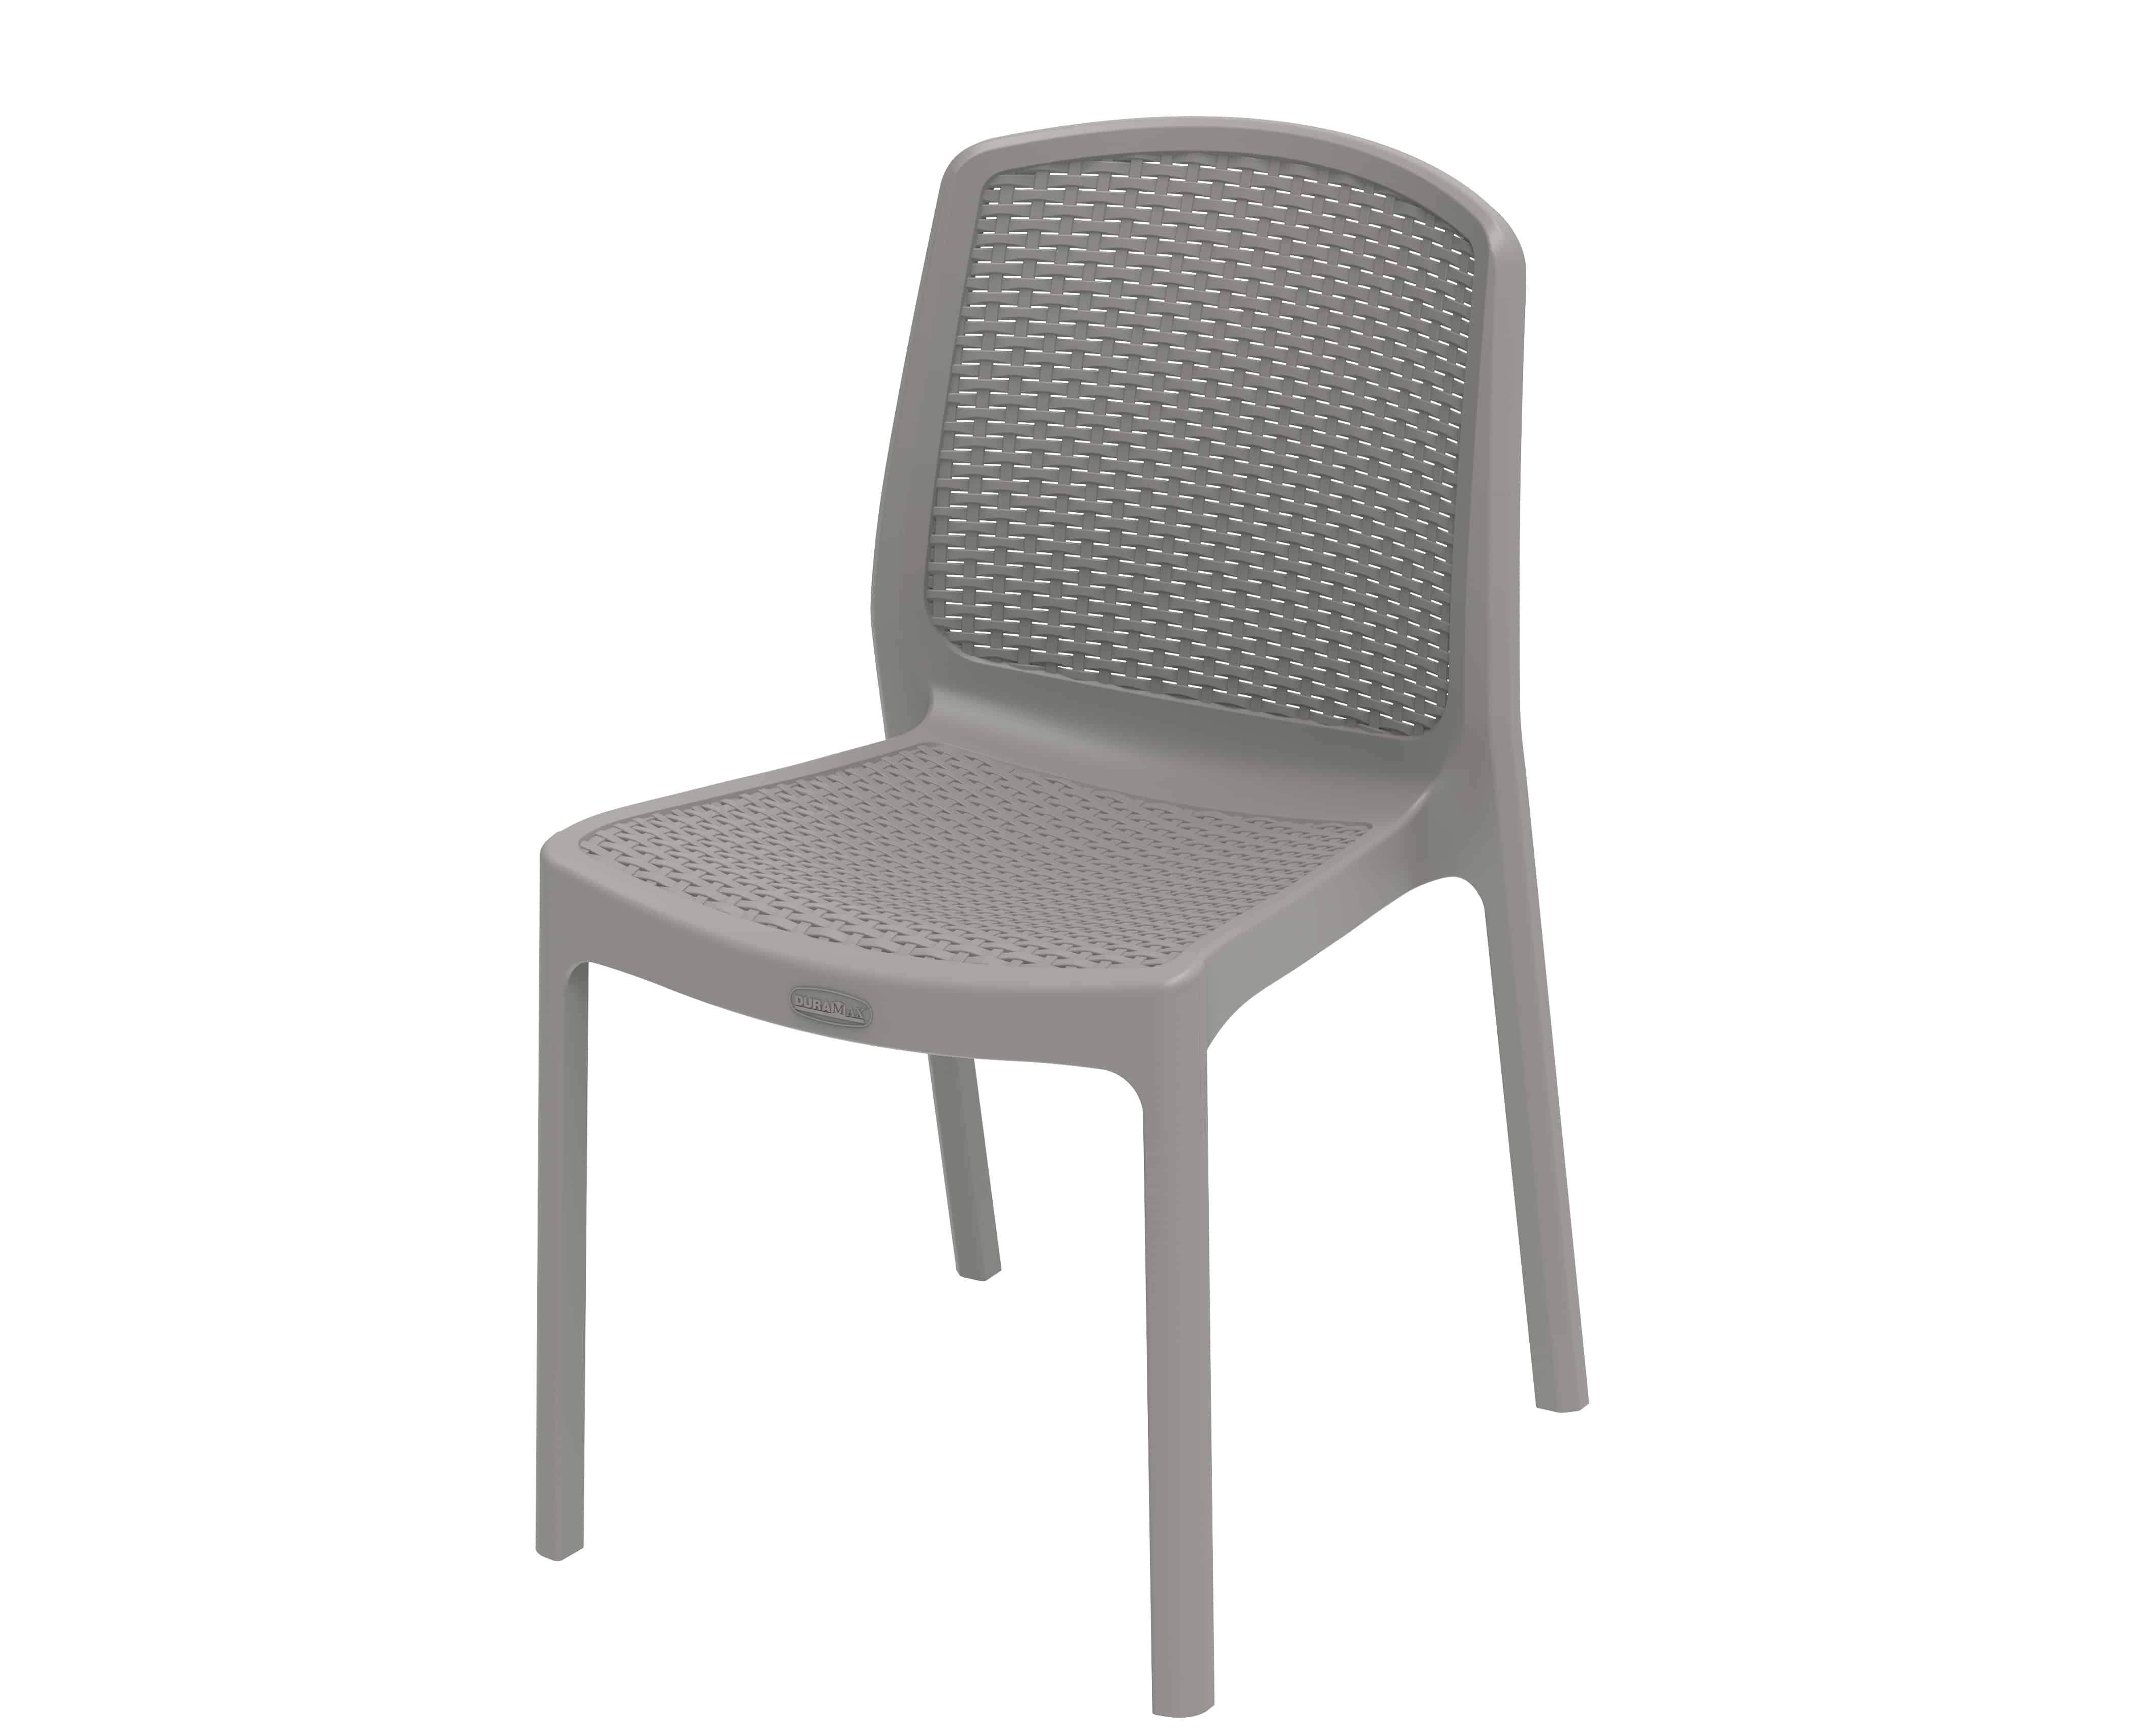 CedarRattan Chair